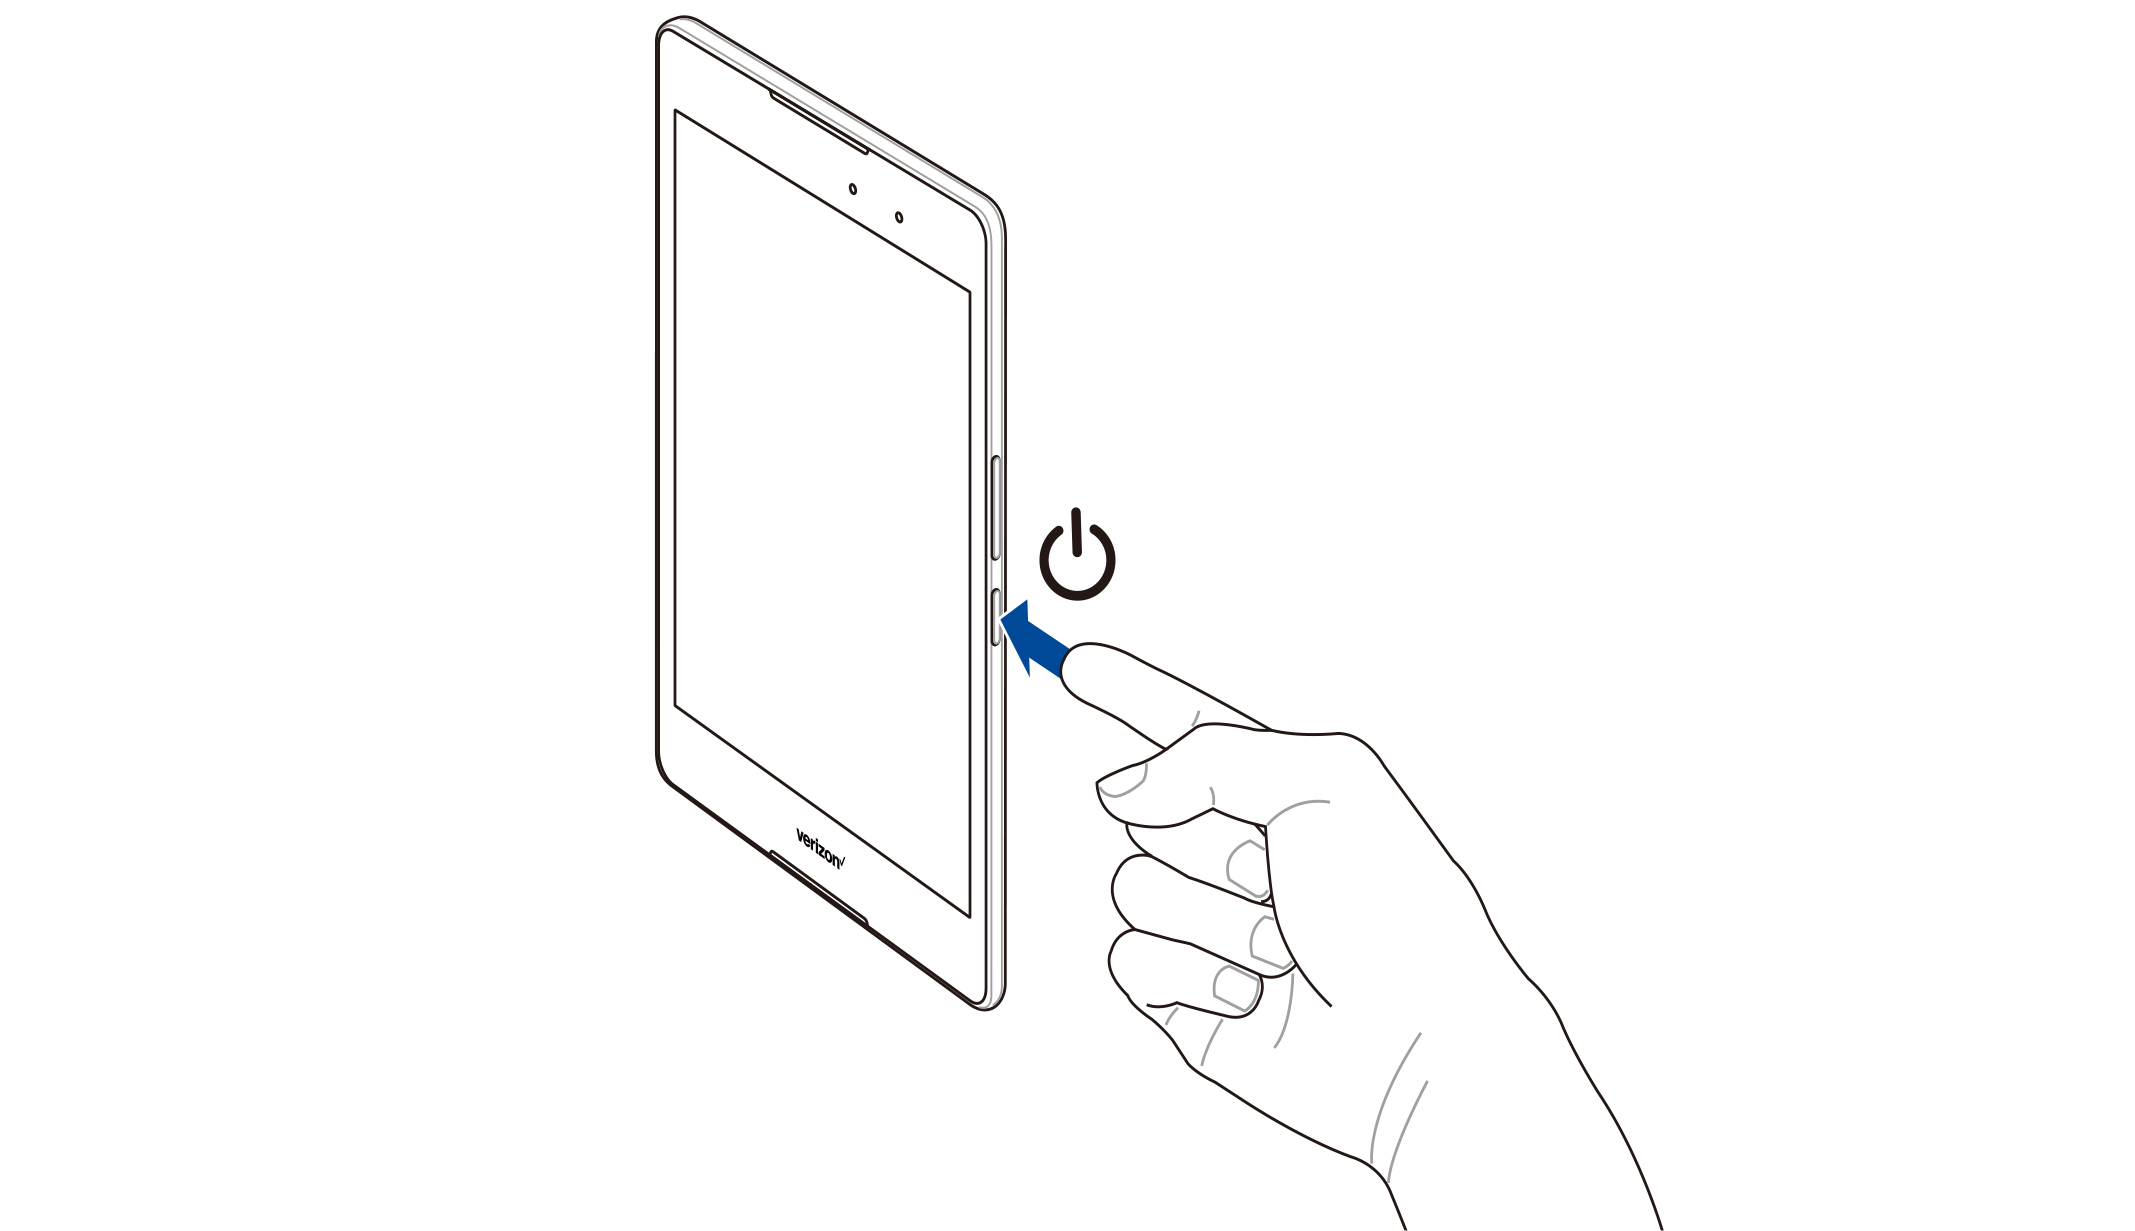 Asus Tablet Wont Turn On